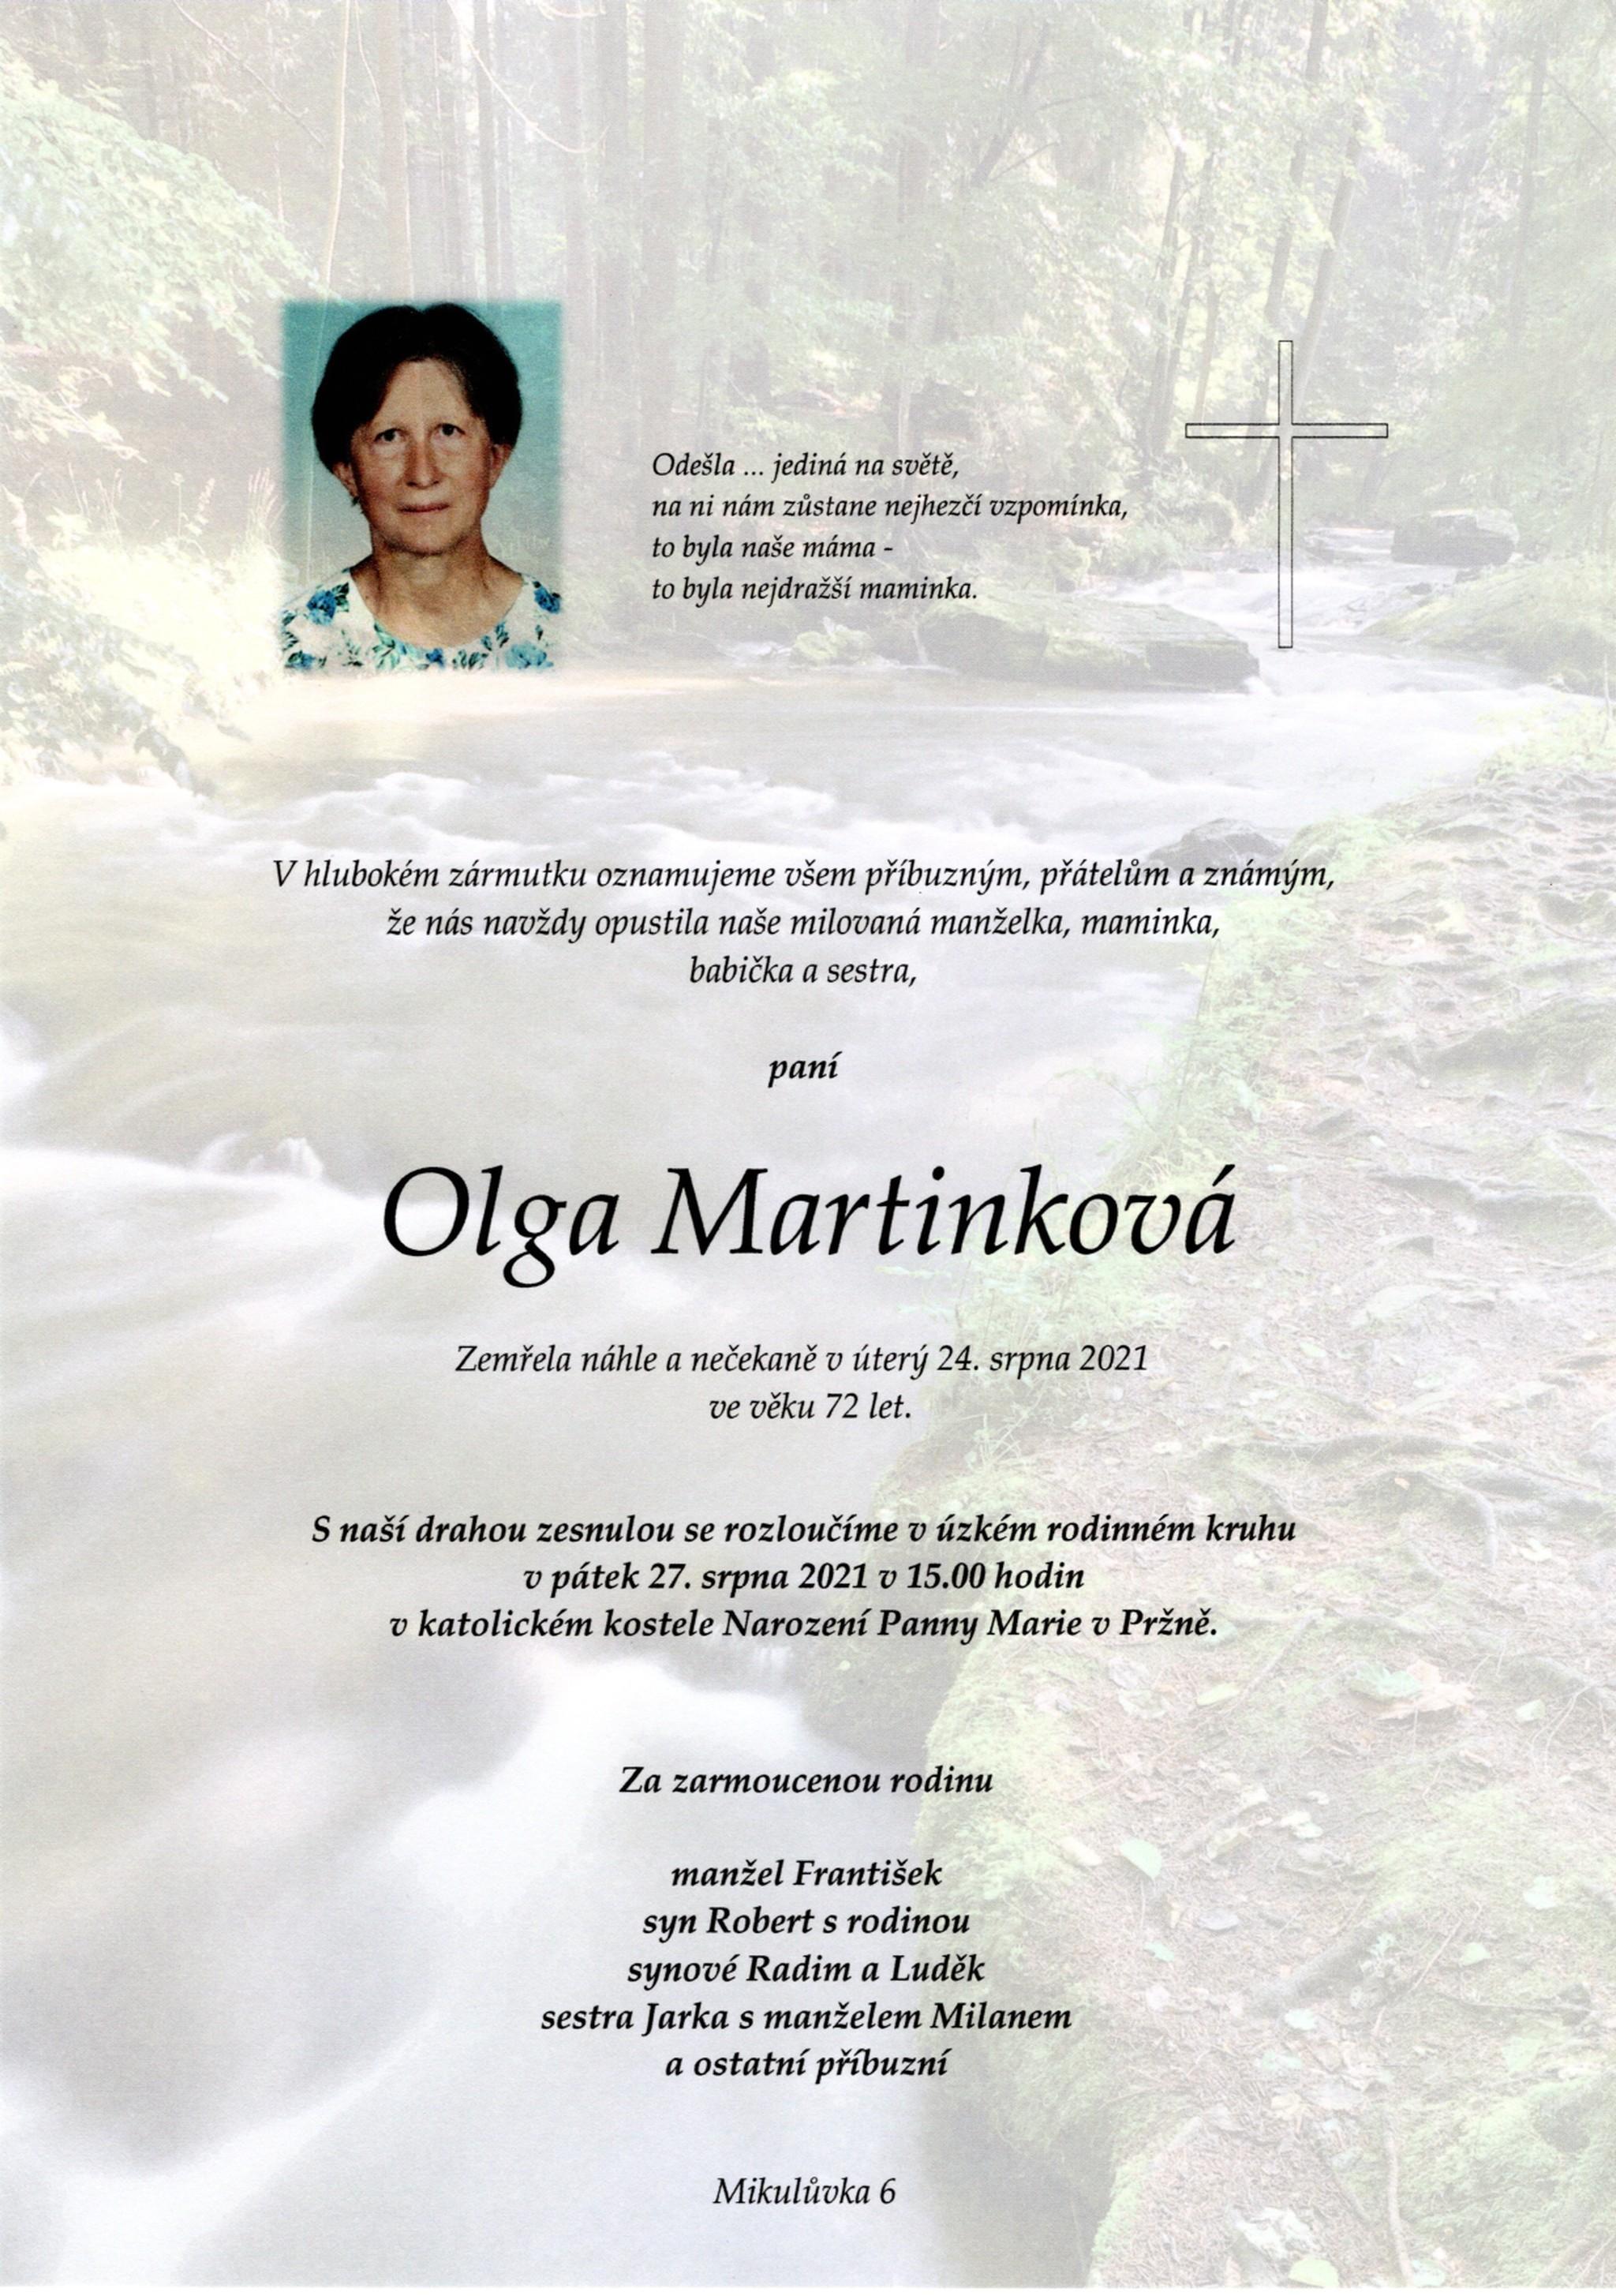 Olga Martinková